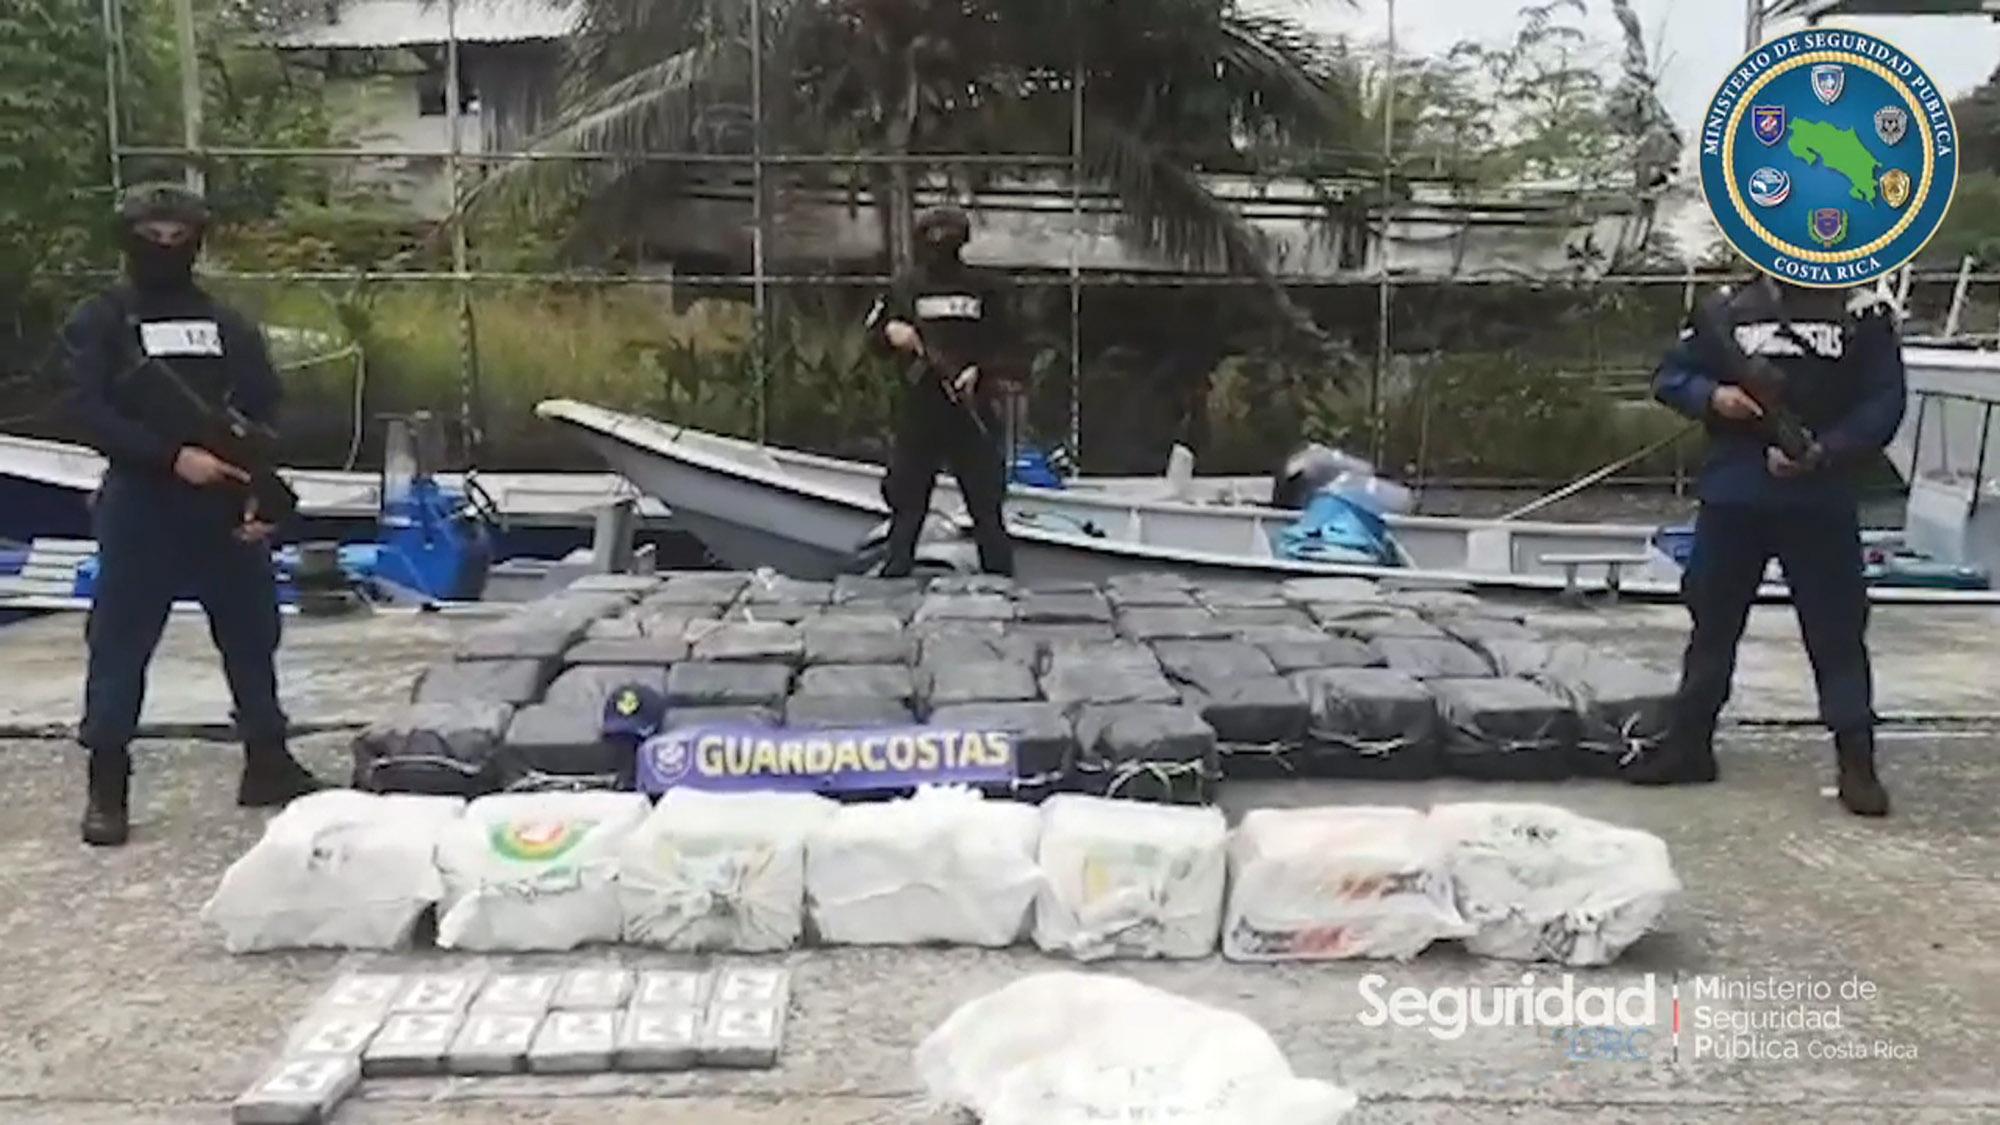 Newsflash-CocaineCostaRica-14